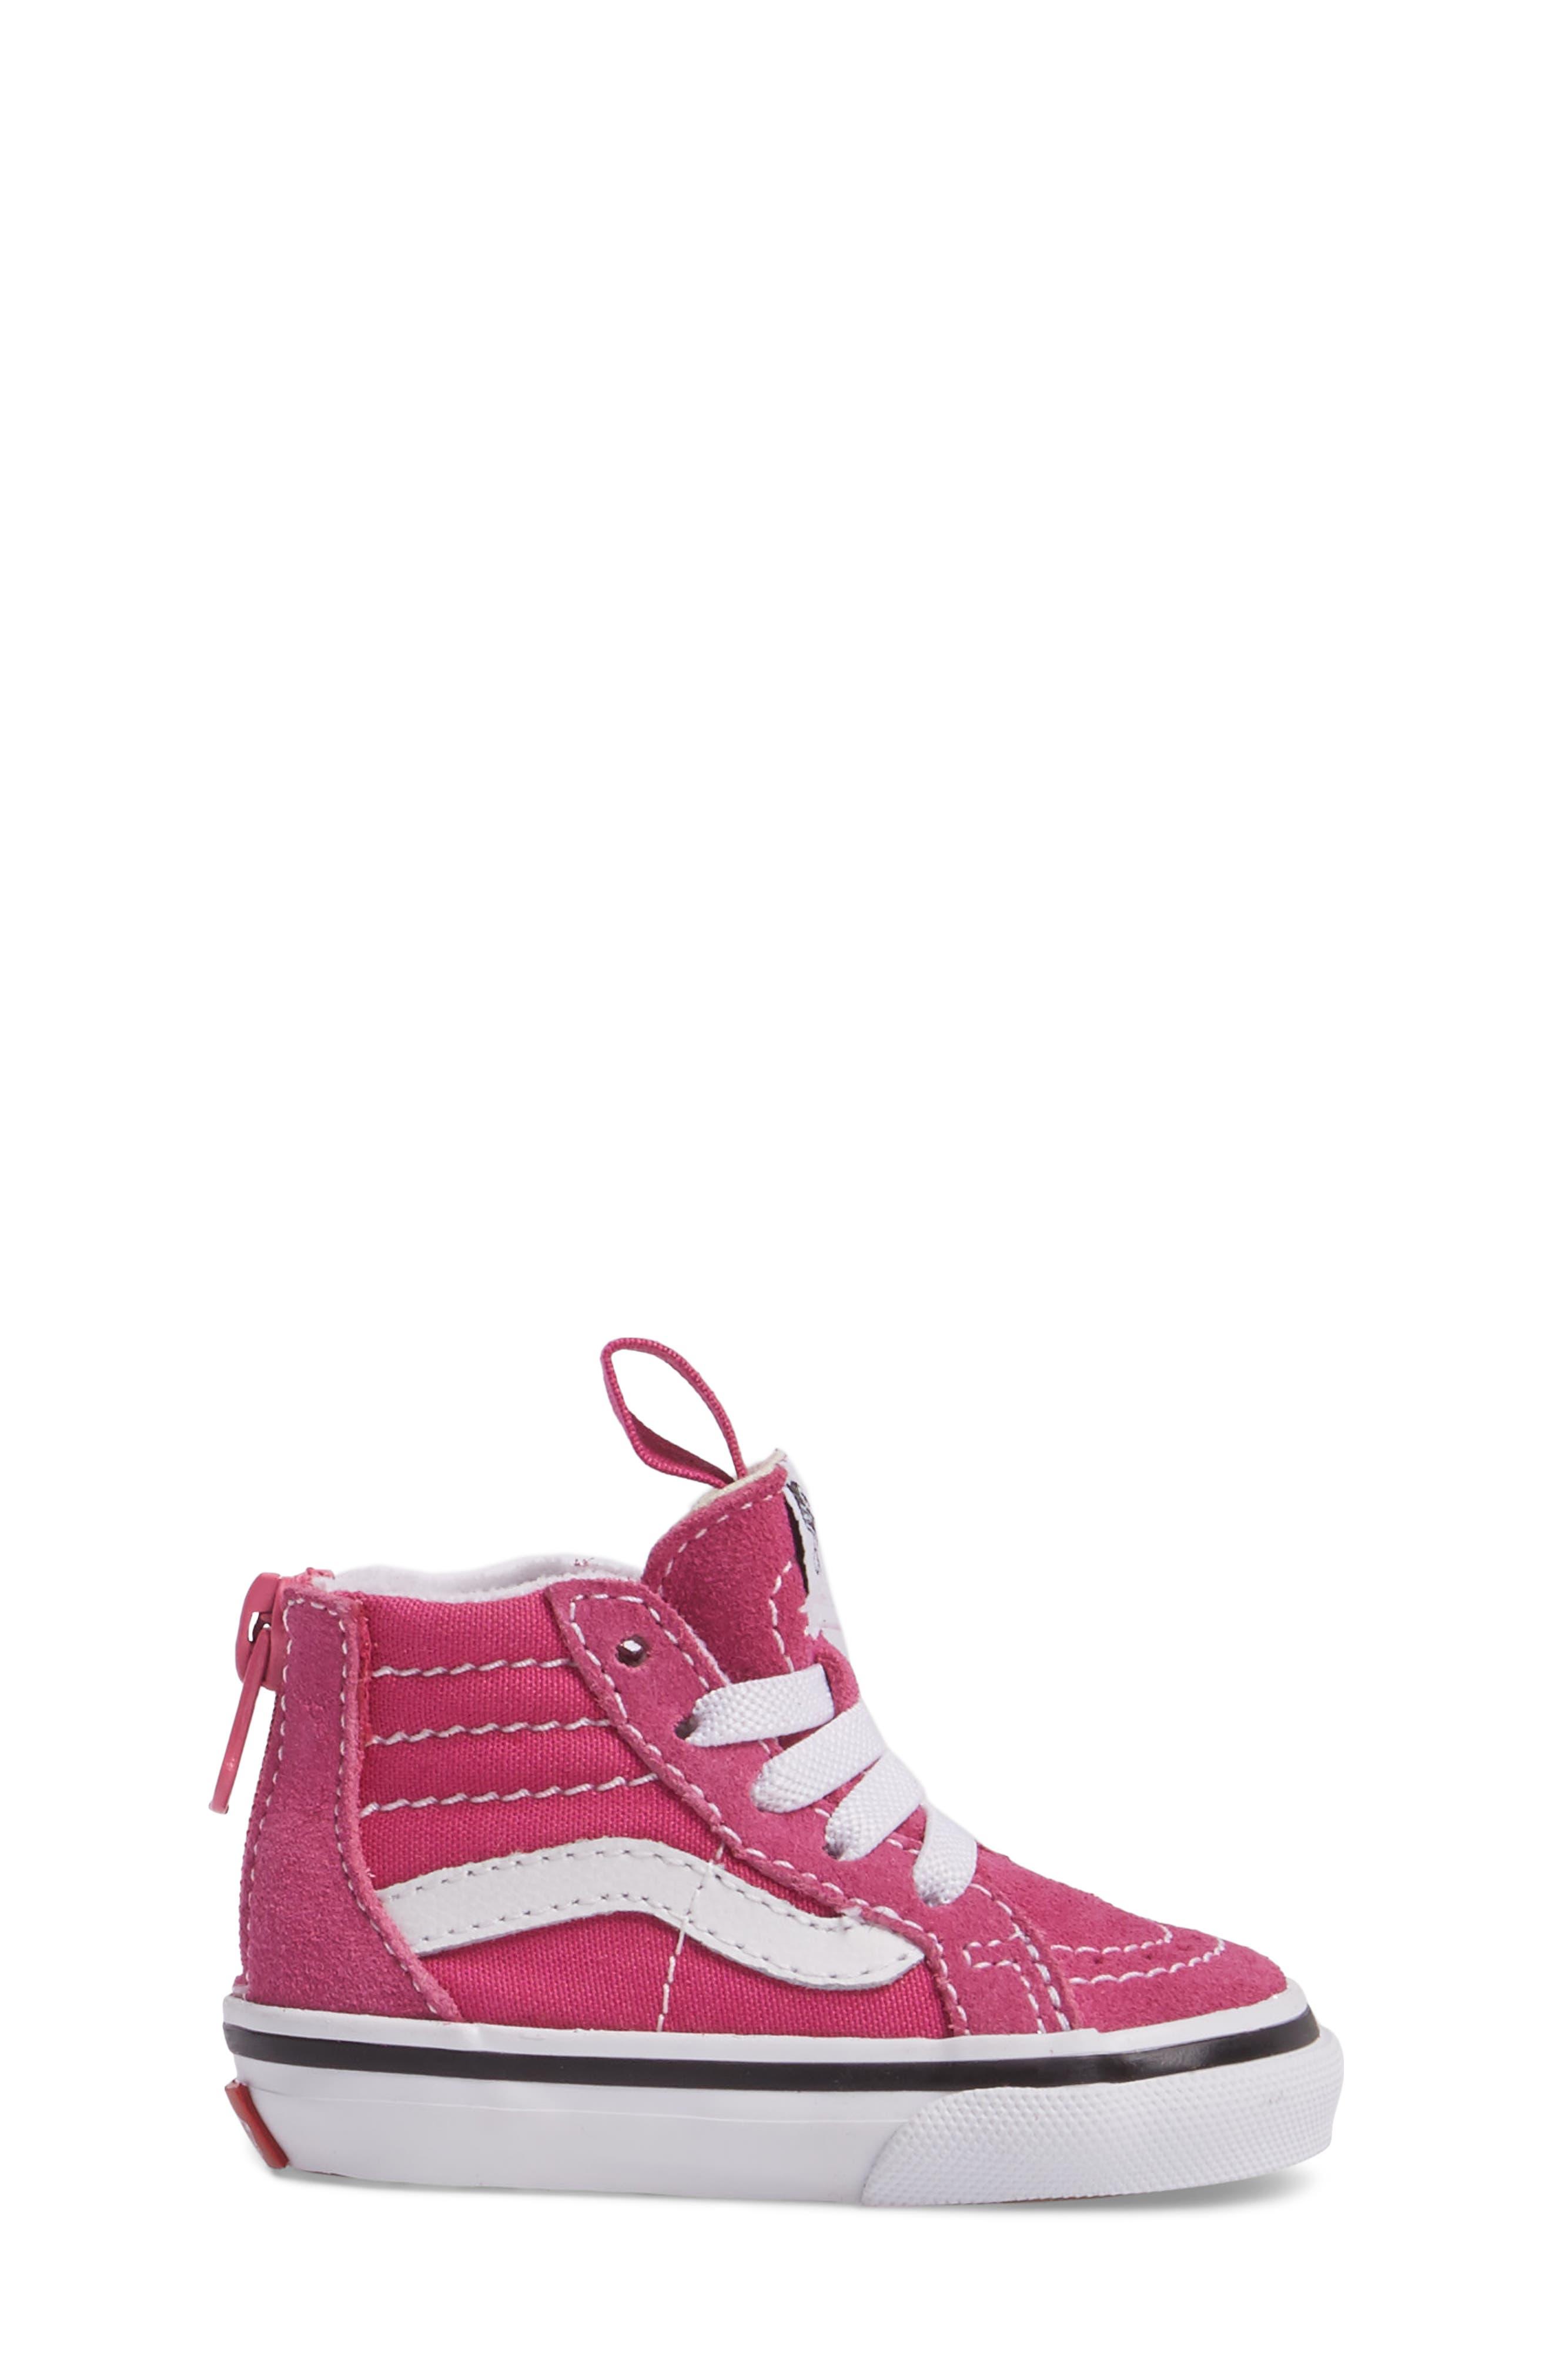 Alternate Image 3  - Vans Sk8-Hi Zip Sneaker (Baby, Walker, Toddler, Little Kid & Big Kid)